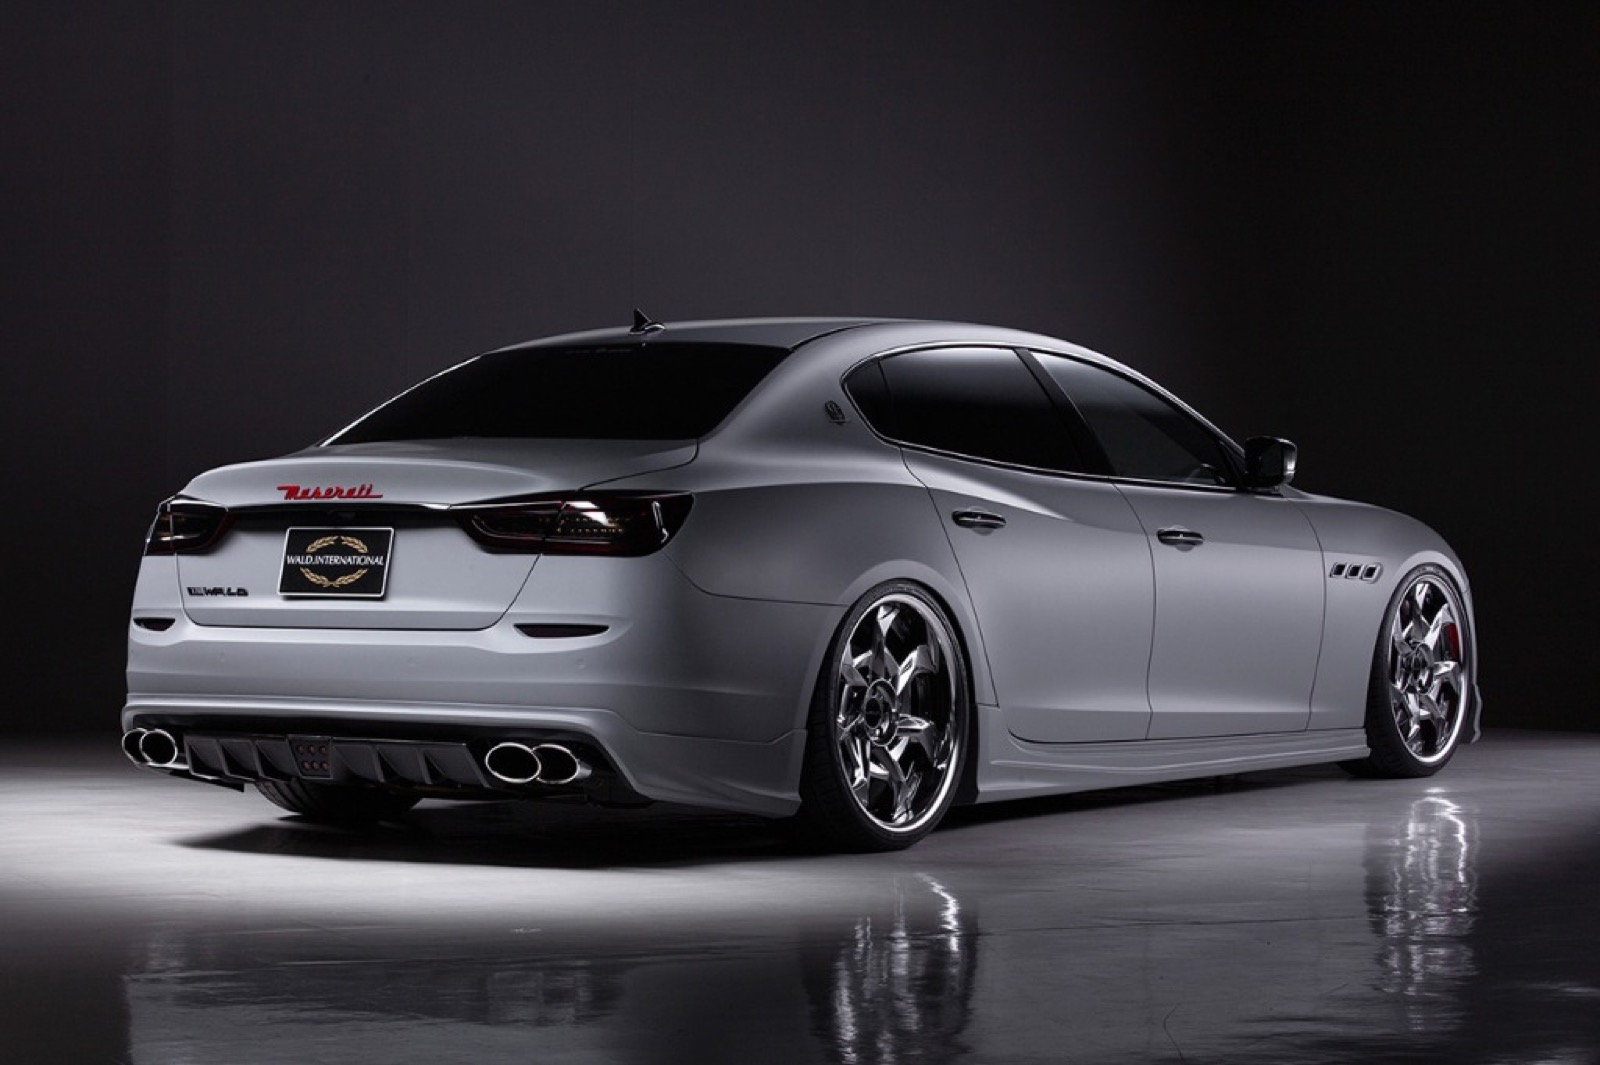 Maserati_Quattroporte_Wald_International_0002